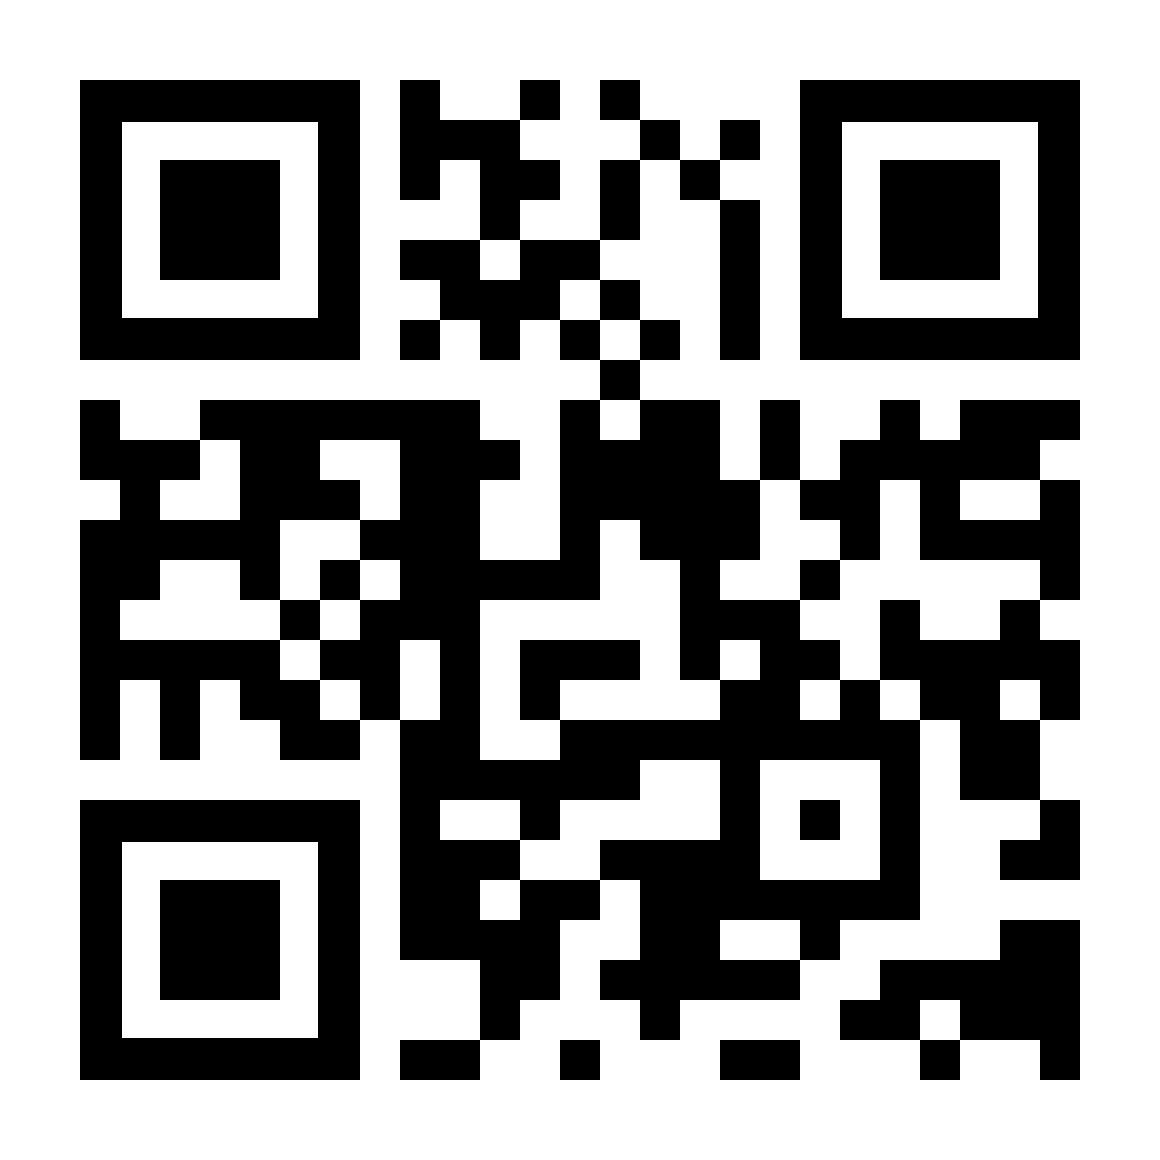 A QR code linking to kaspersky.com